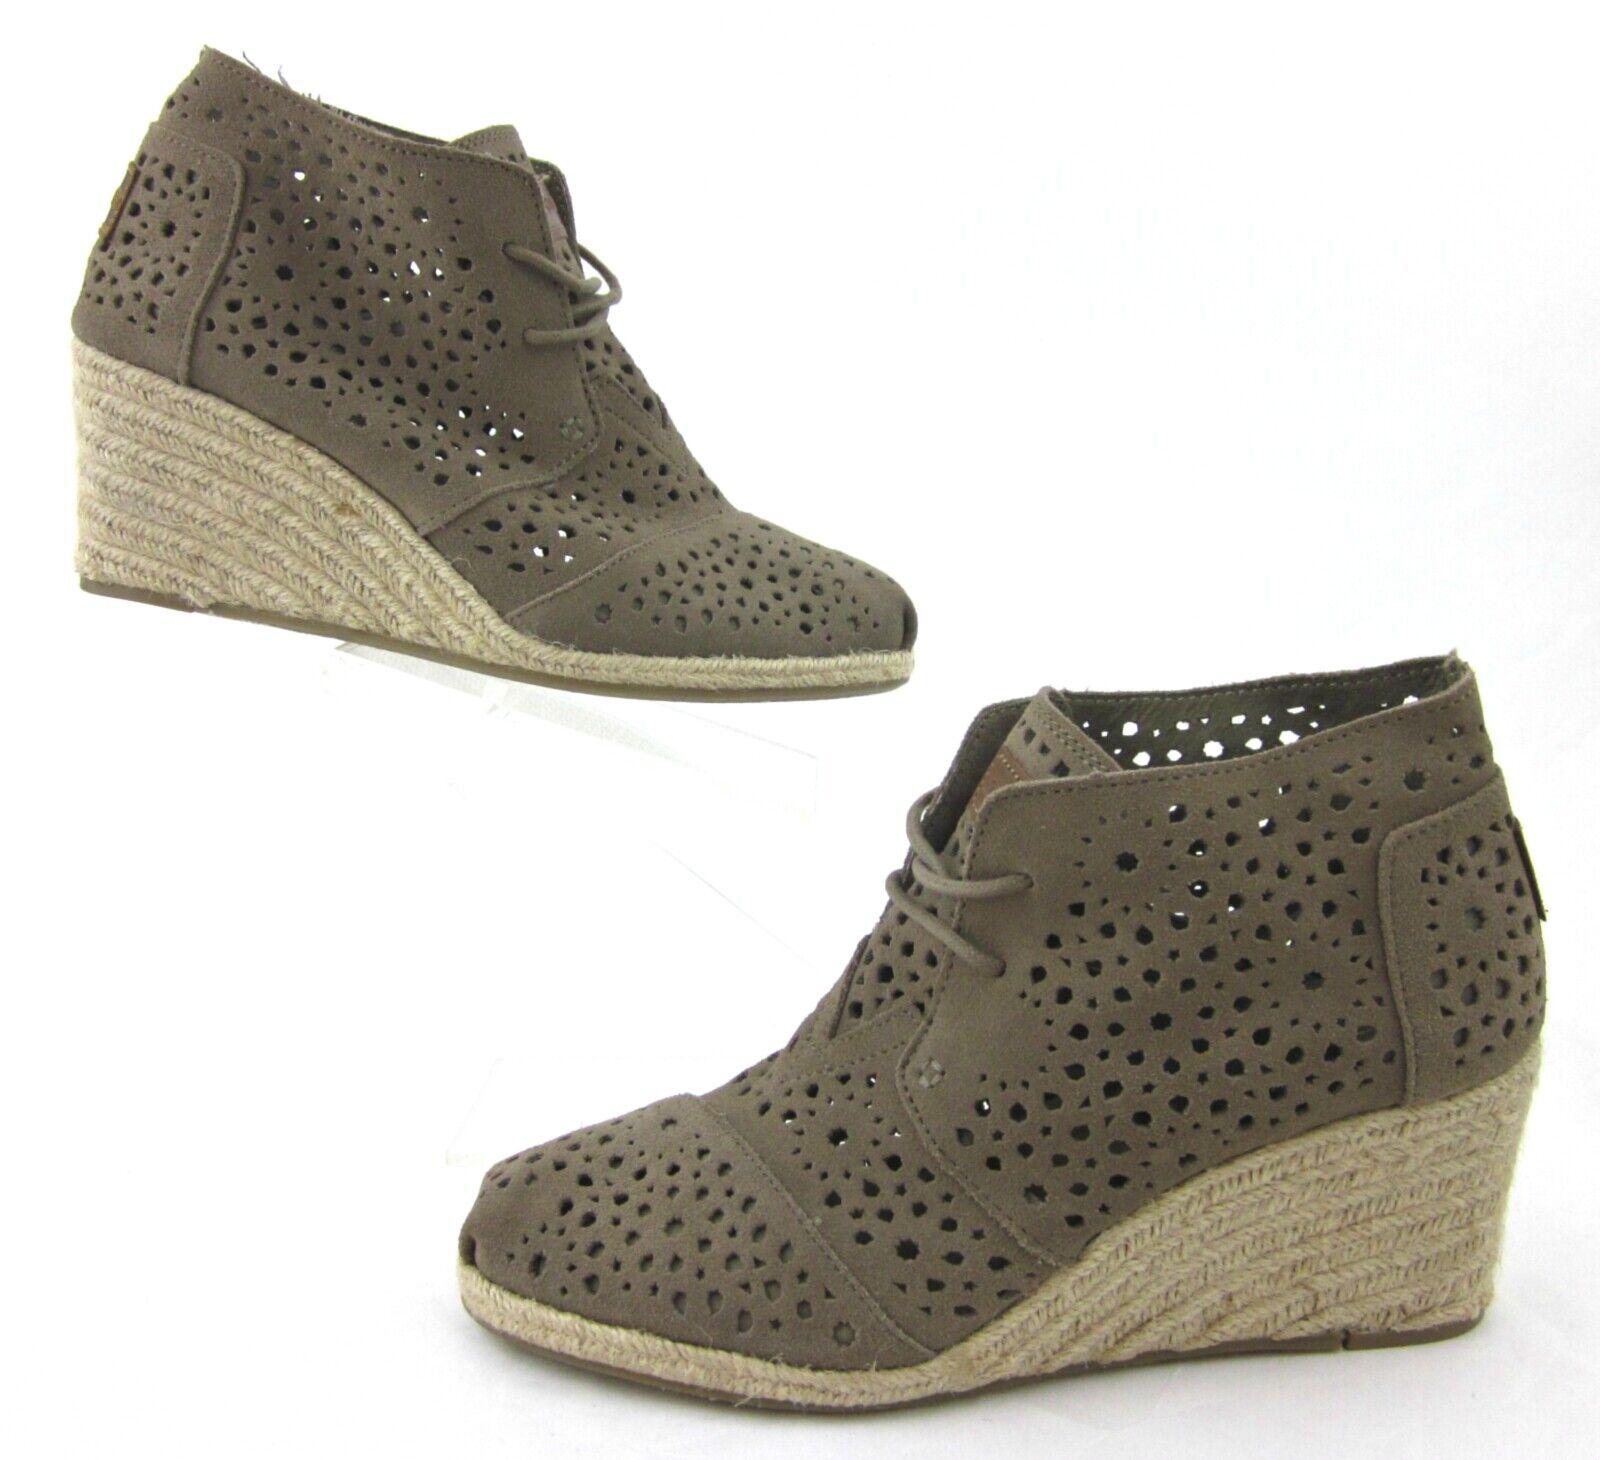 * NEUF! * Toms marocain Découpe Desert Wedge chaussons taupe en daim 9.5 US